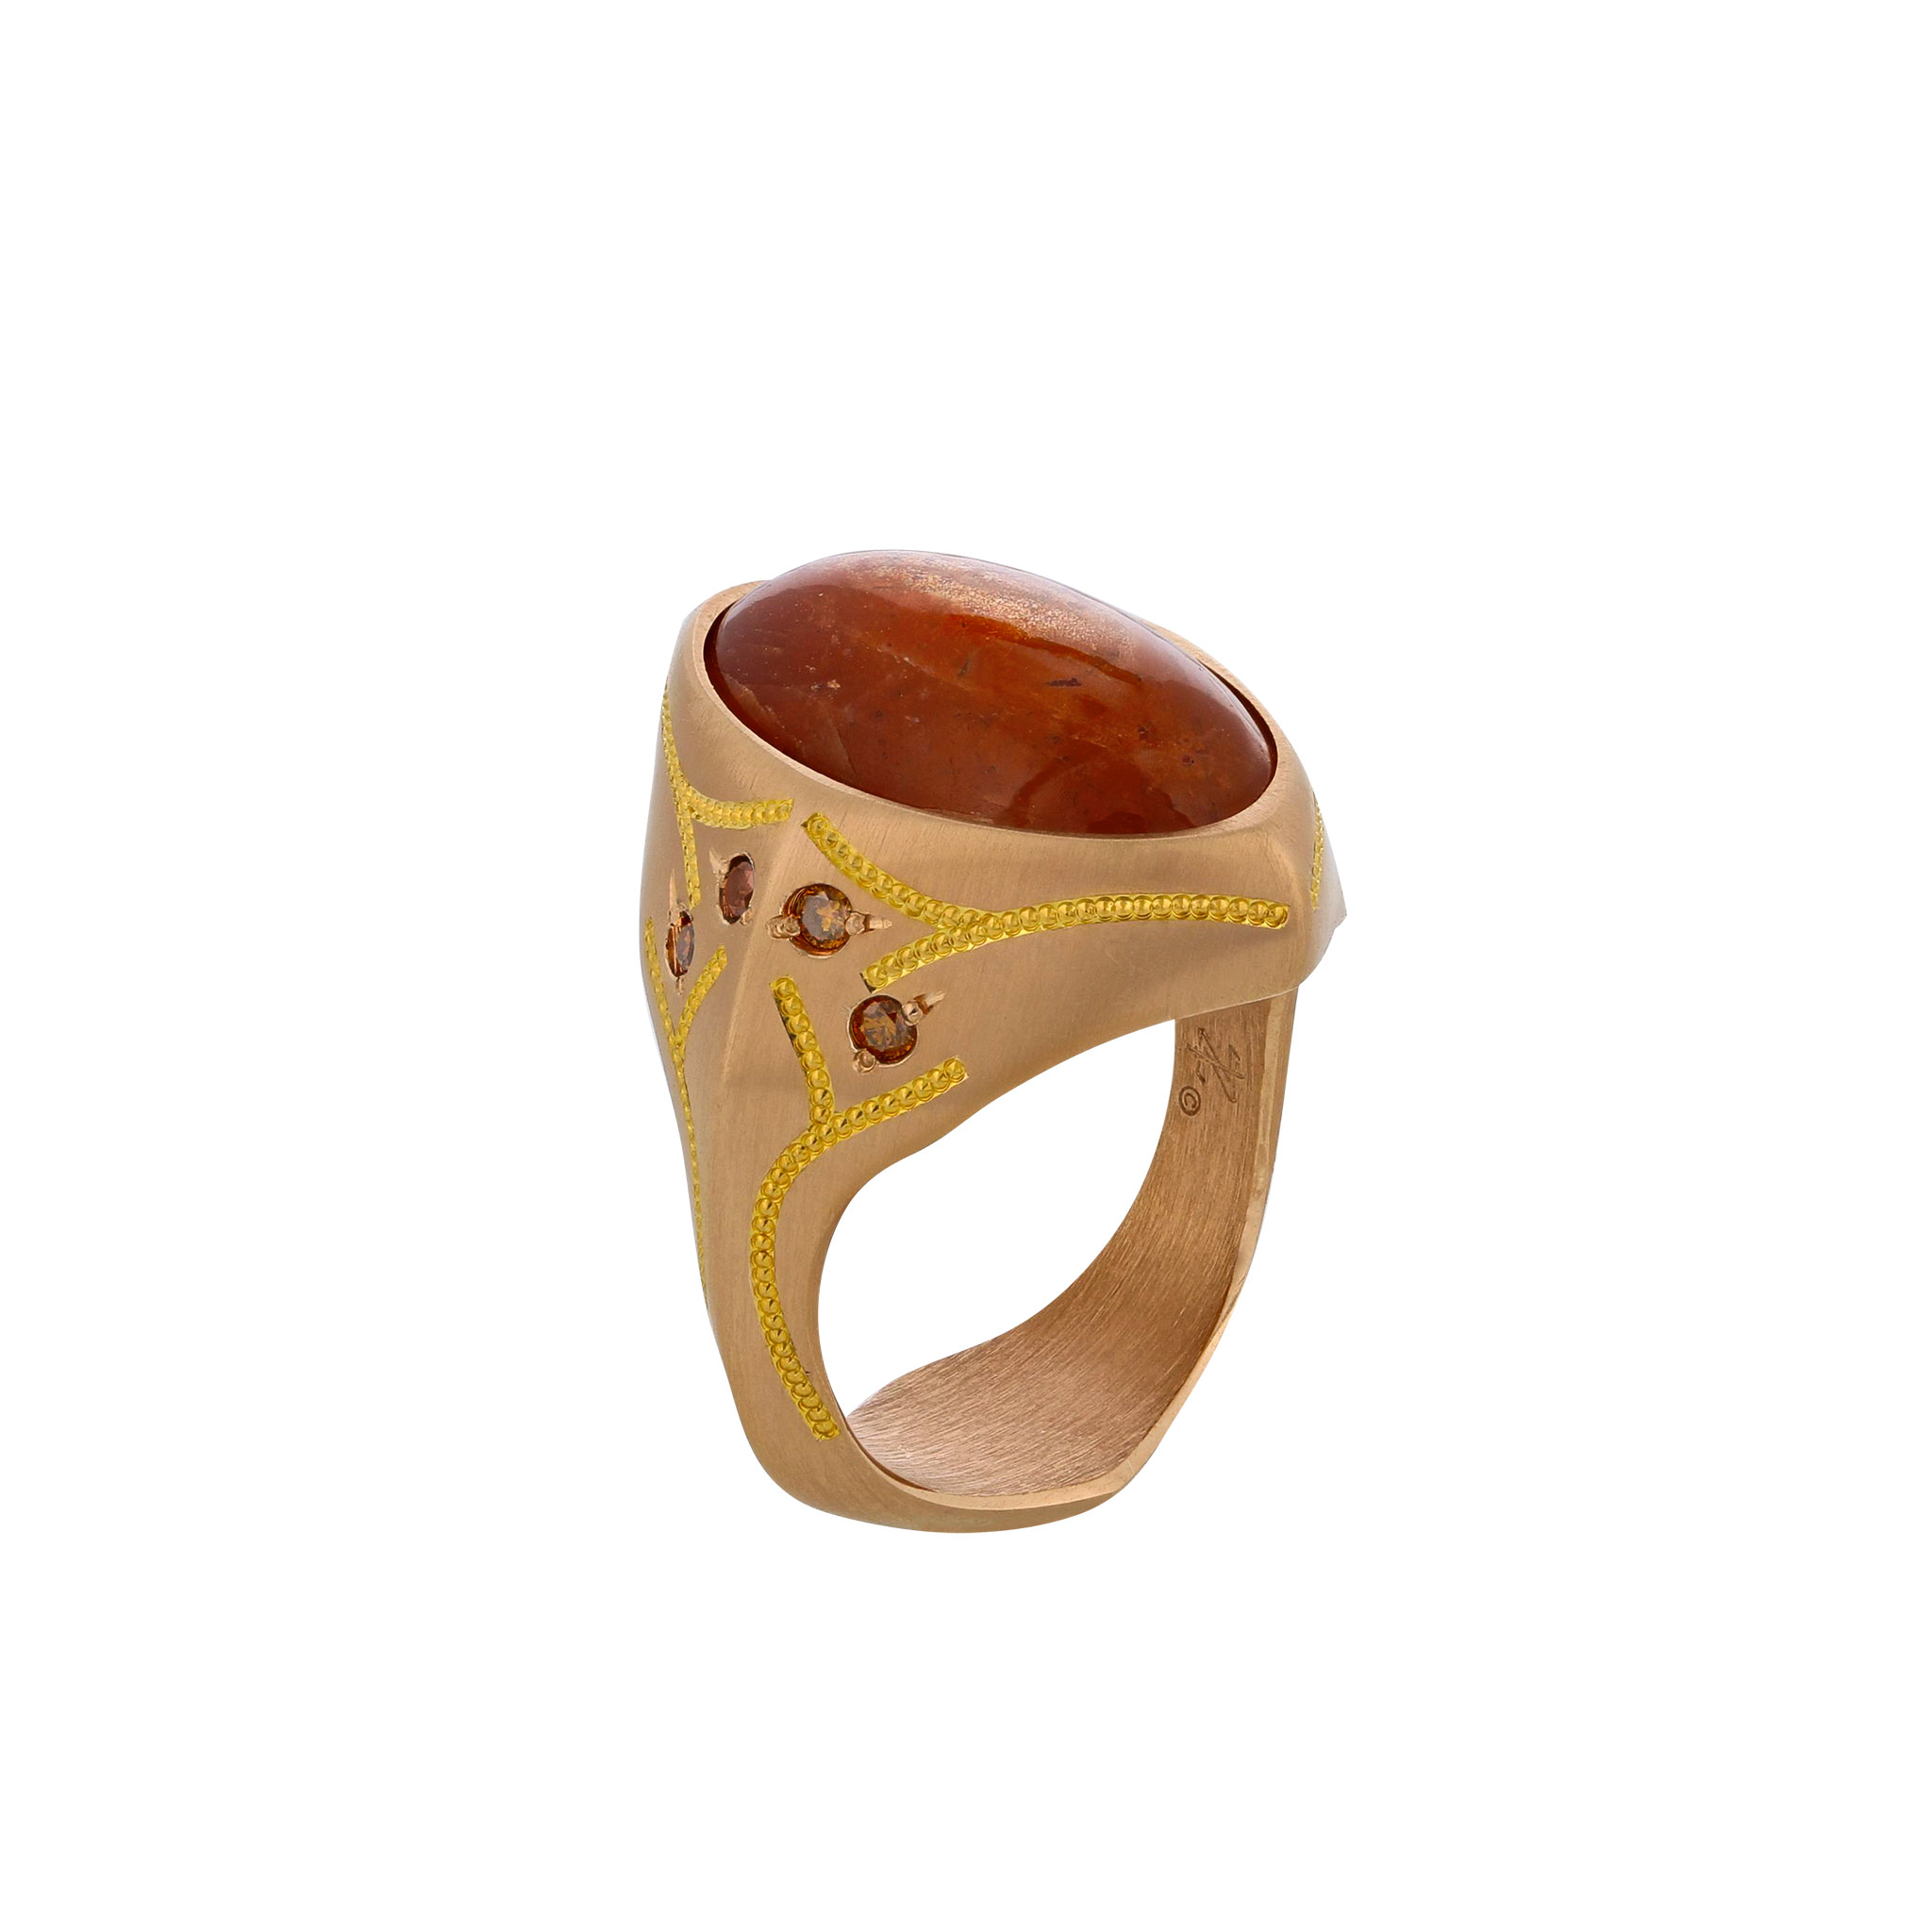 Sunstone Ring in Rose Gold